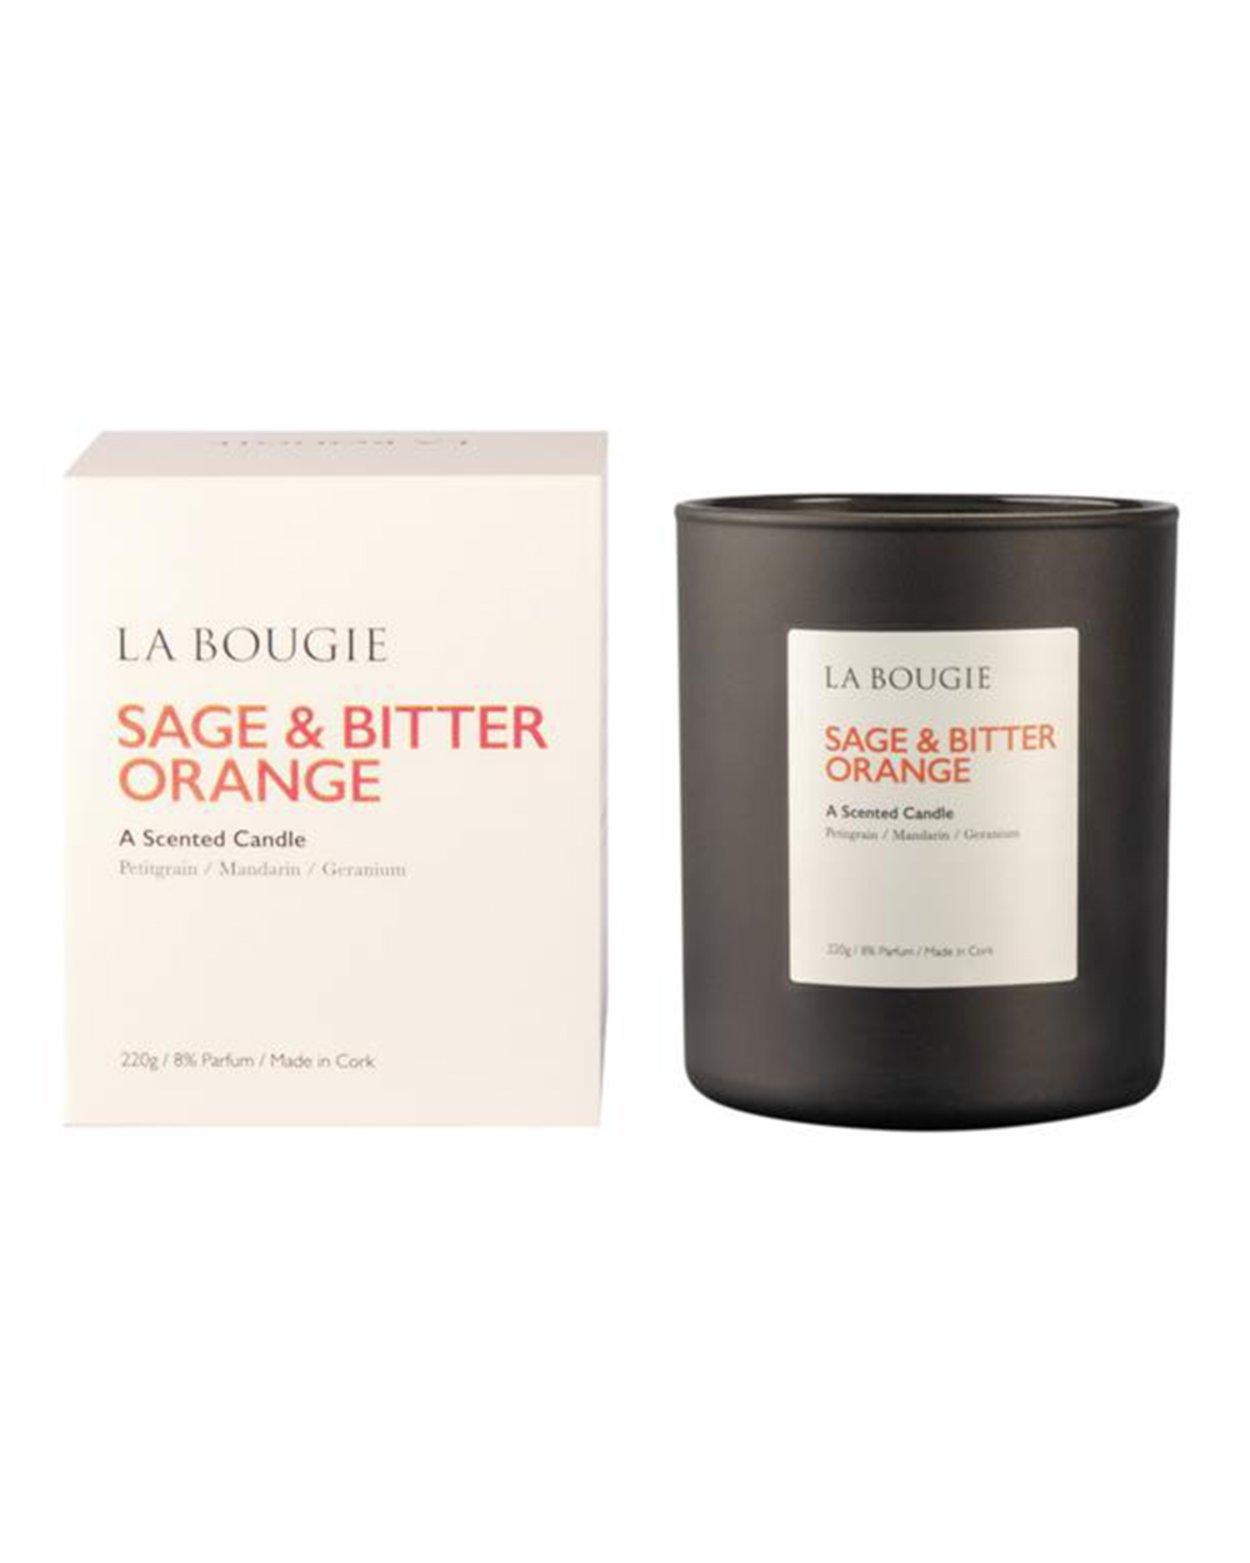 Sage & Bitter Orange Scented Candle